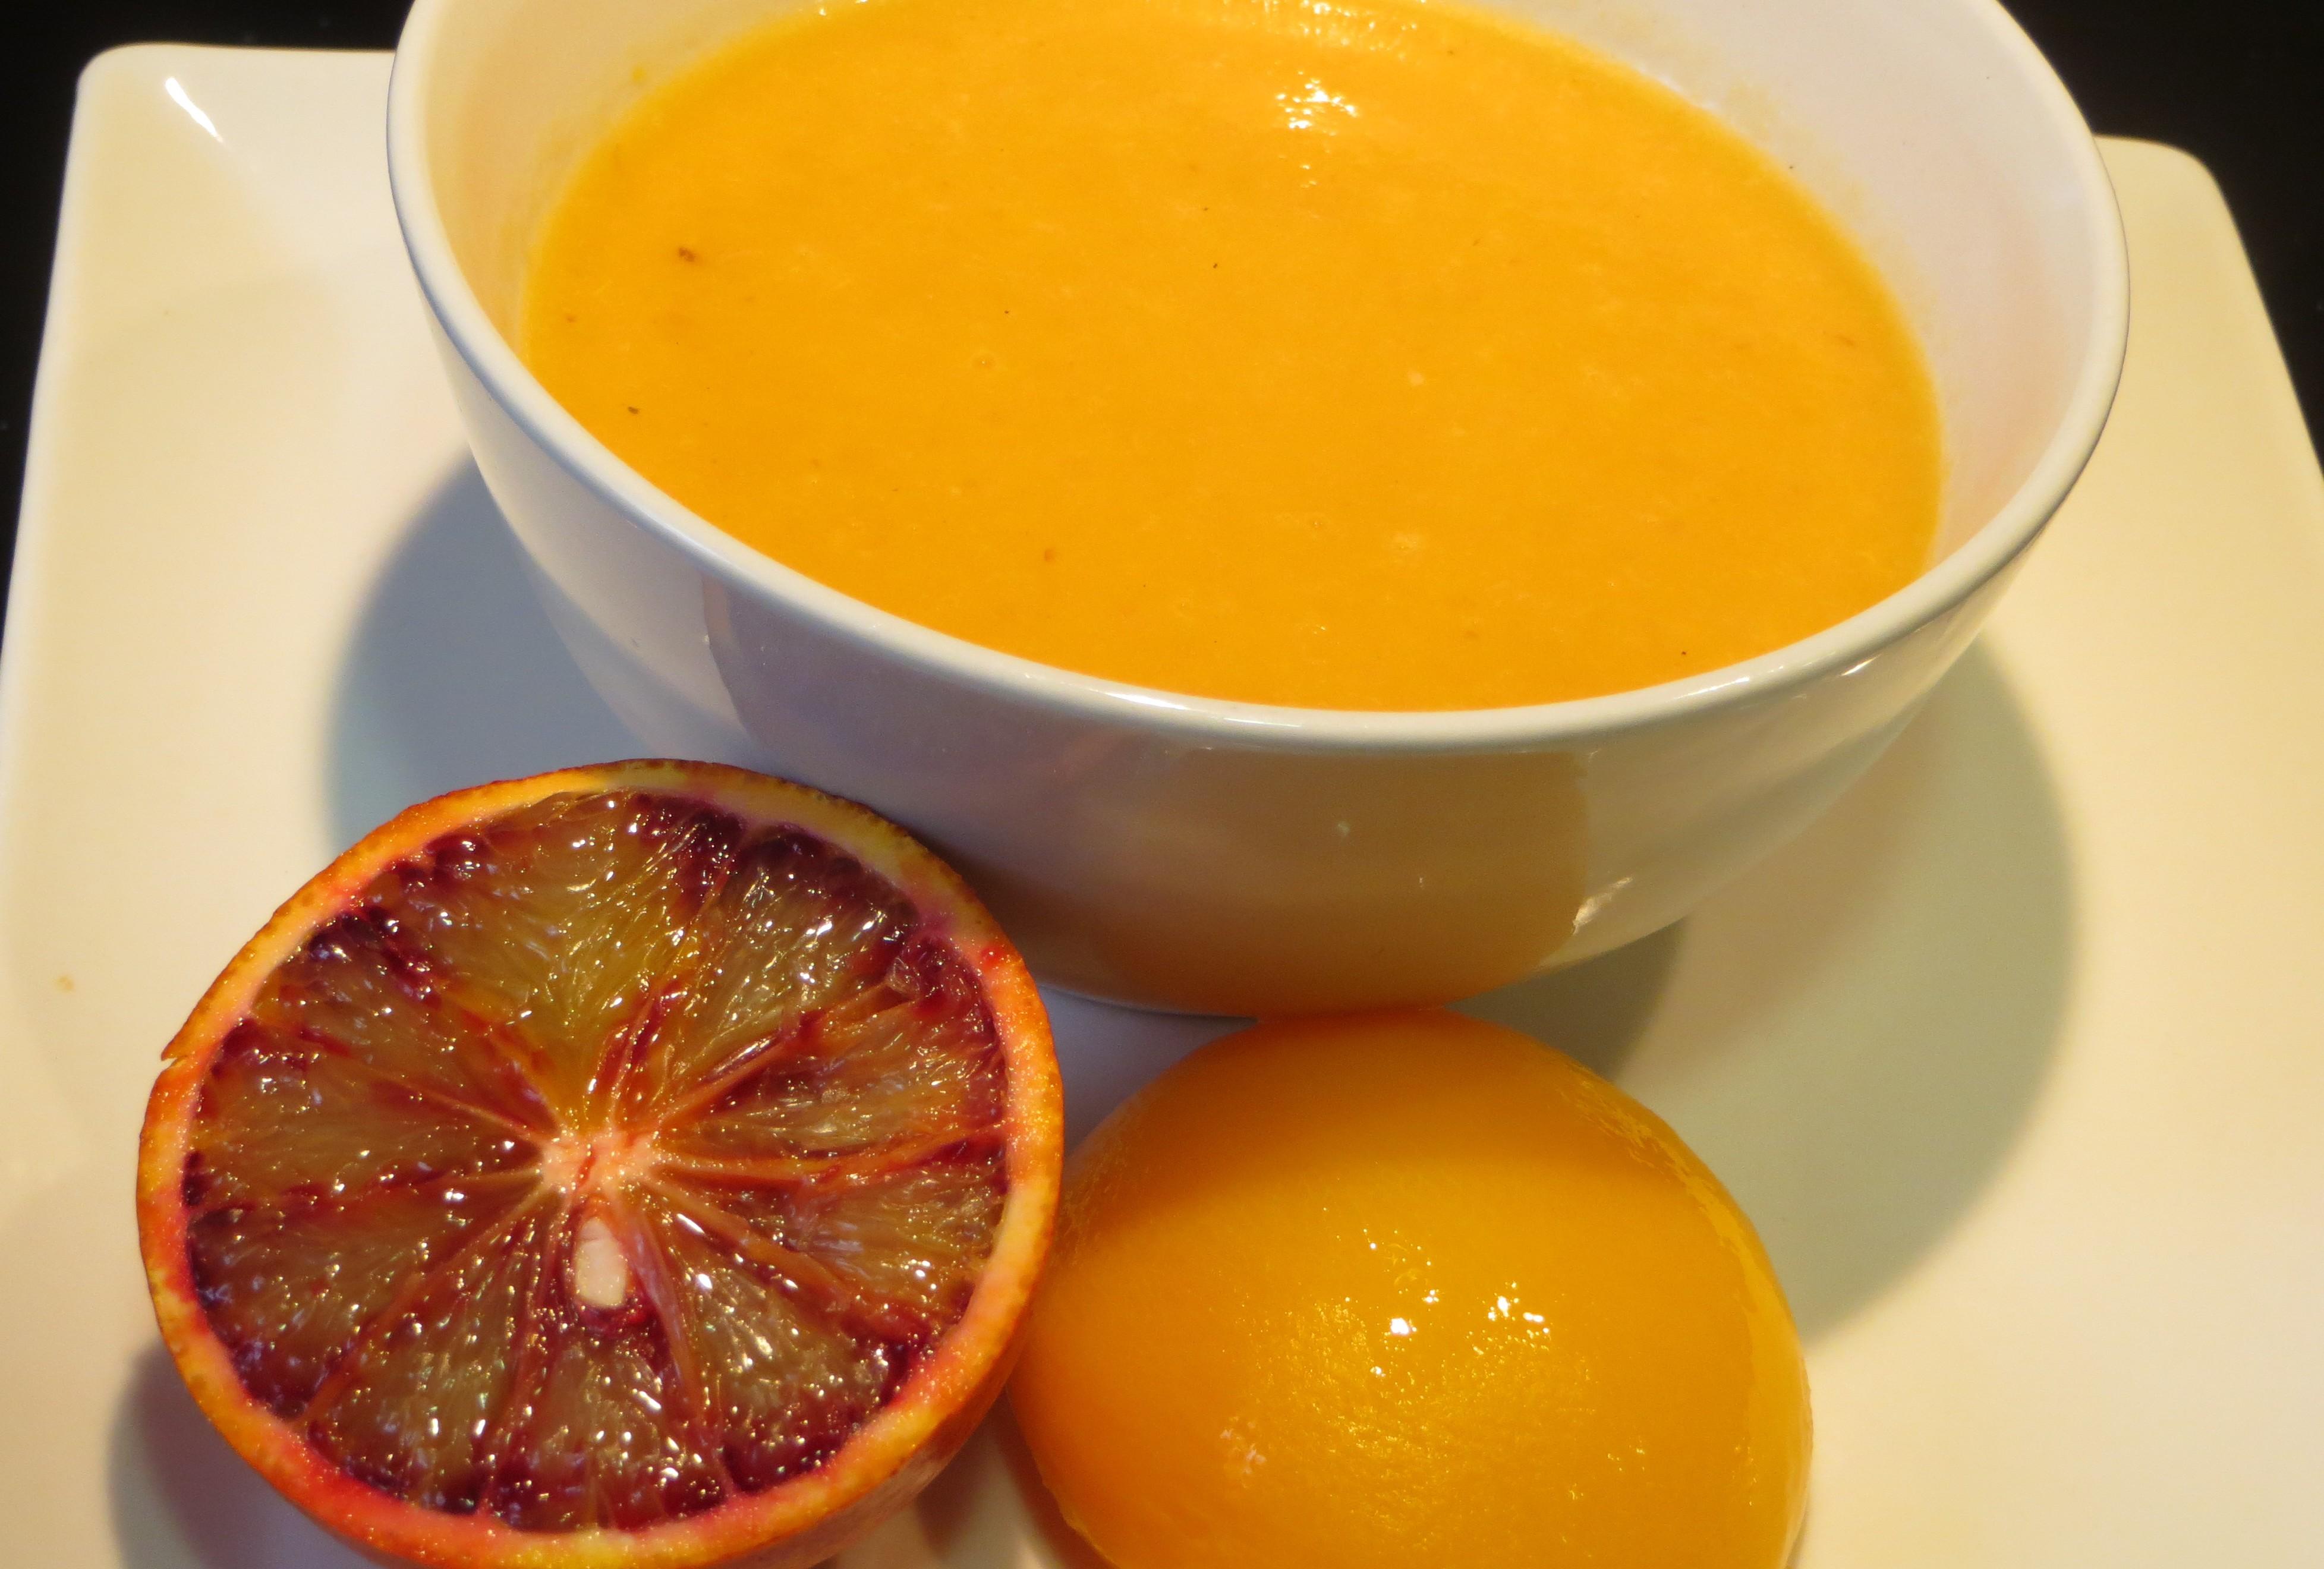 salsa de melocotón y naranja sanguina